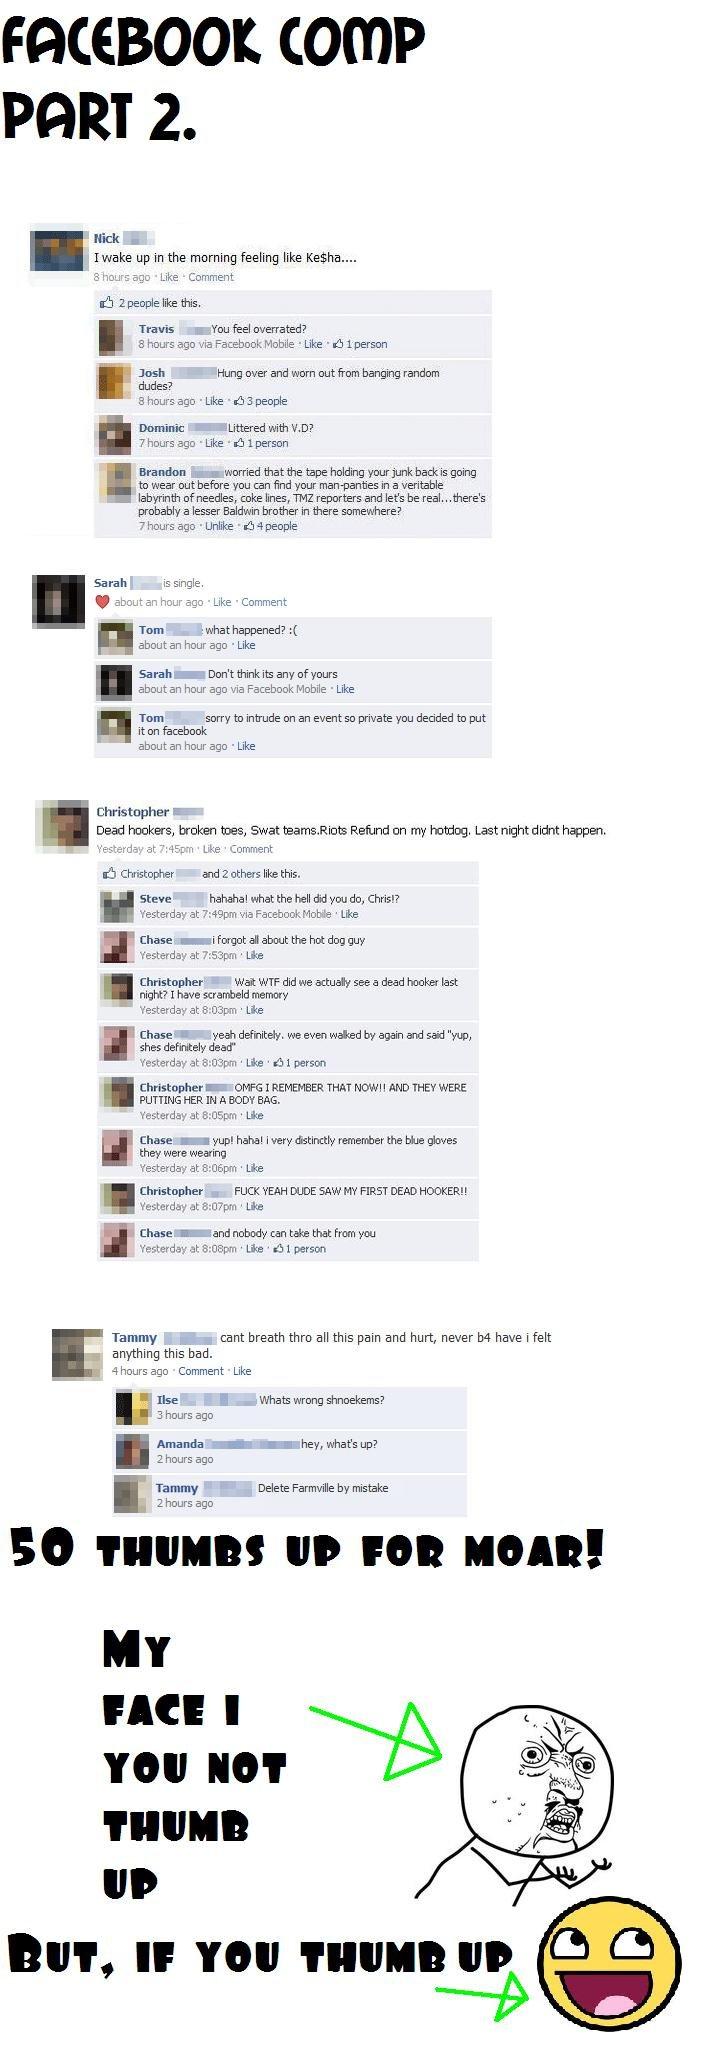 Facebook comp Pt.2. Part 1: /funny_pictures/1520304/Facebook+comp/. FACEBOOK tomp PERT 2. I wake up tn the morning feeling like . 3 i' -I: -we ago Like - Commen facebook comp pt two